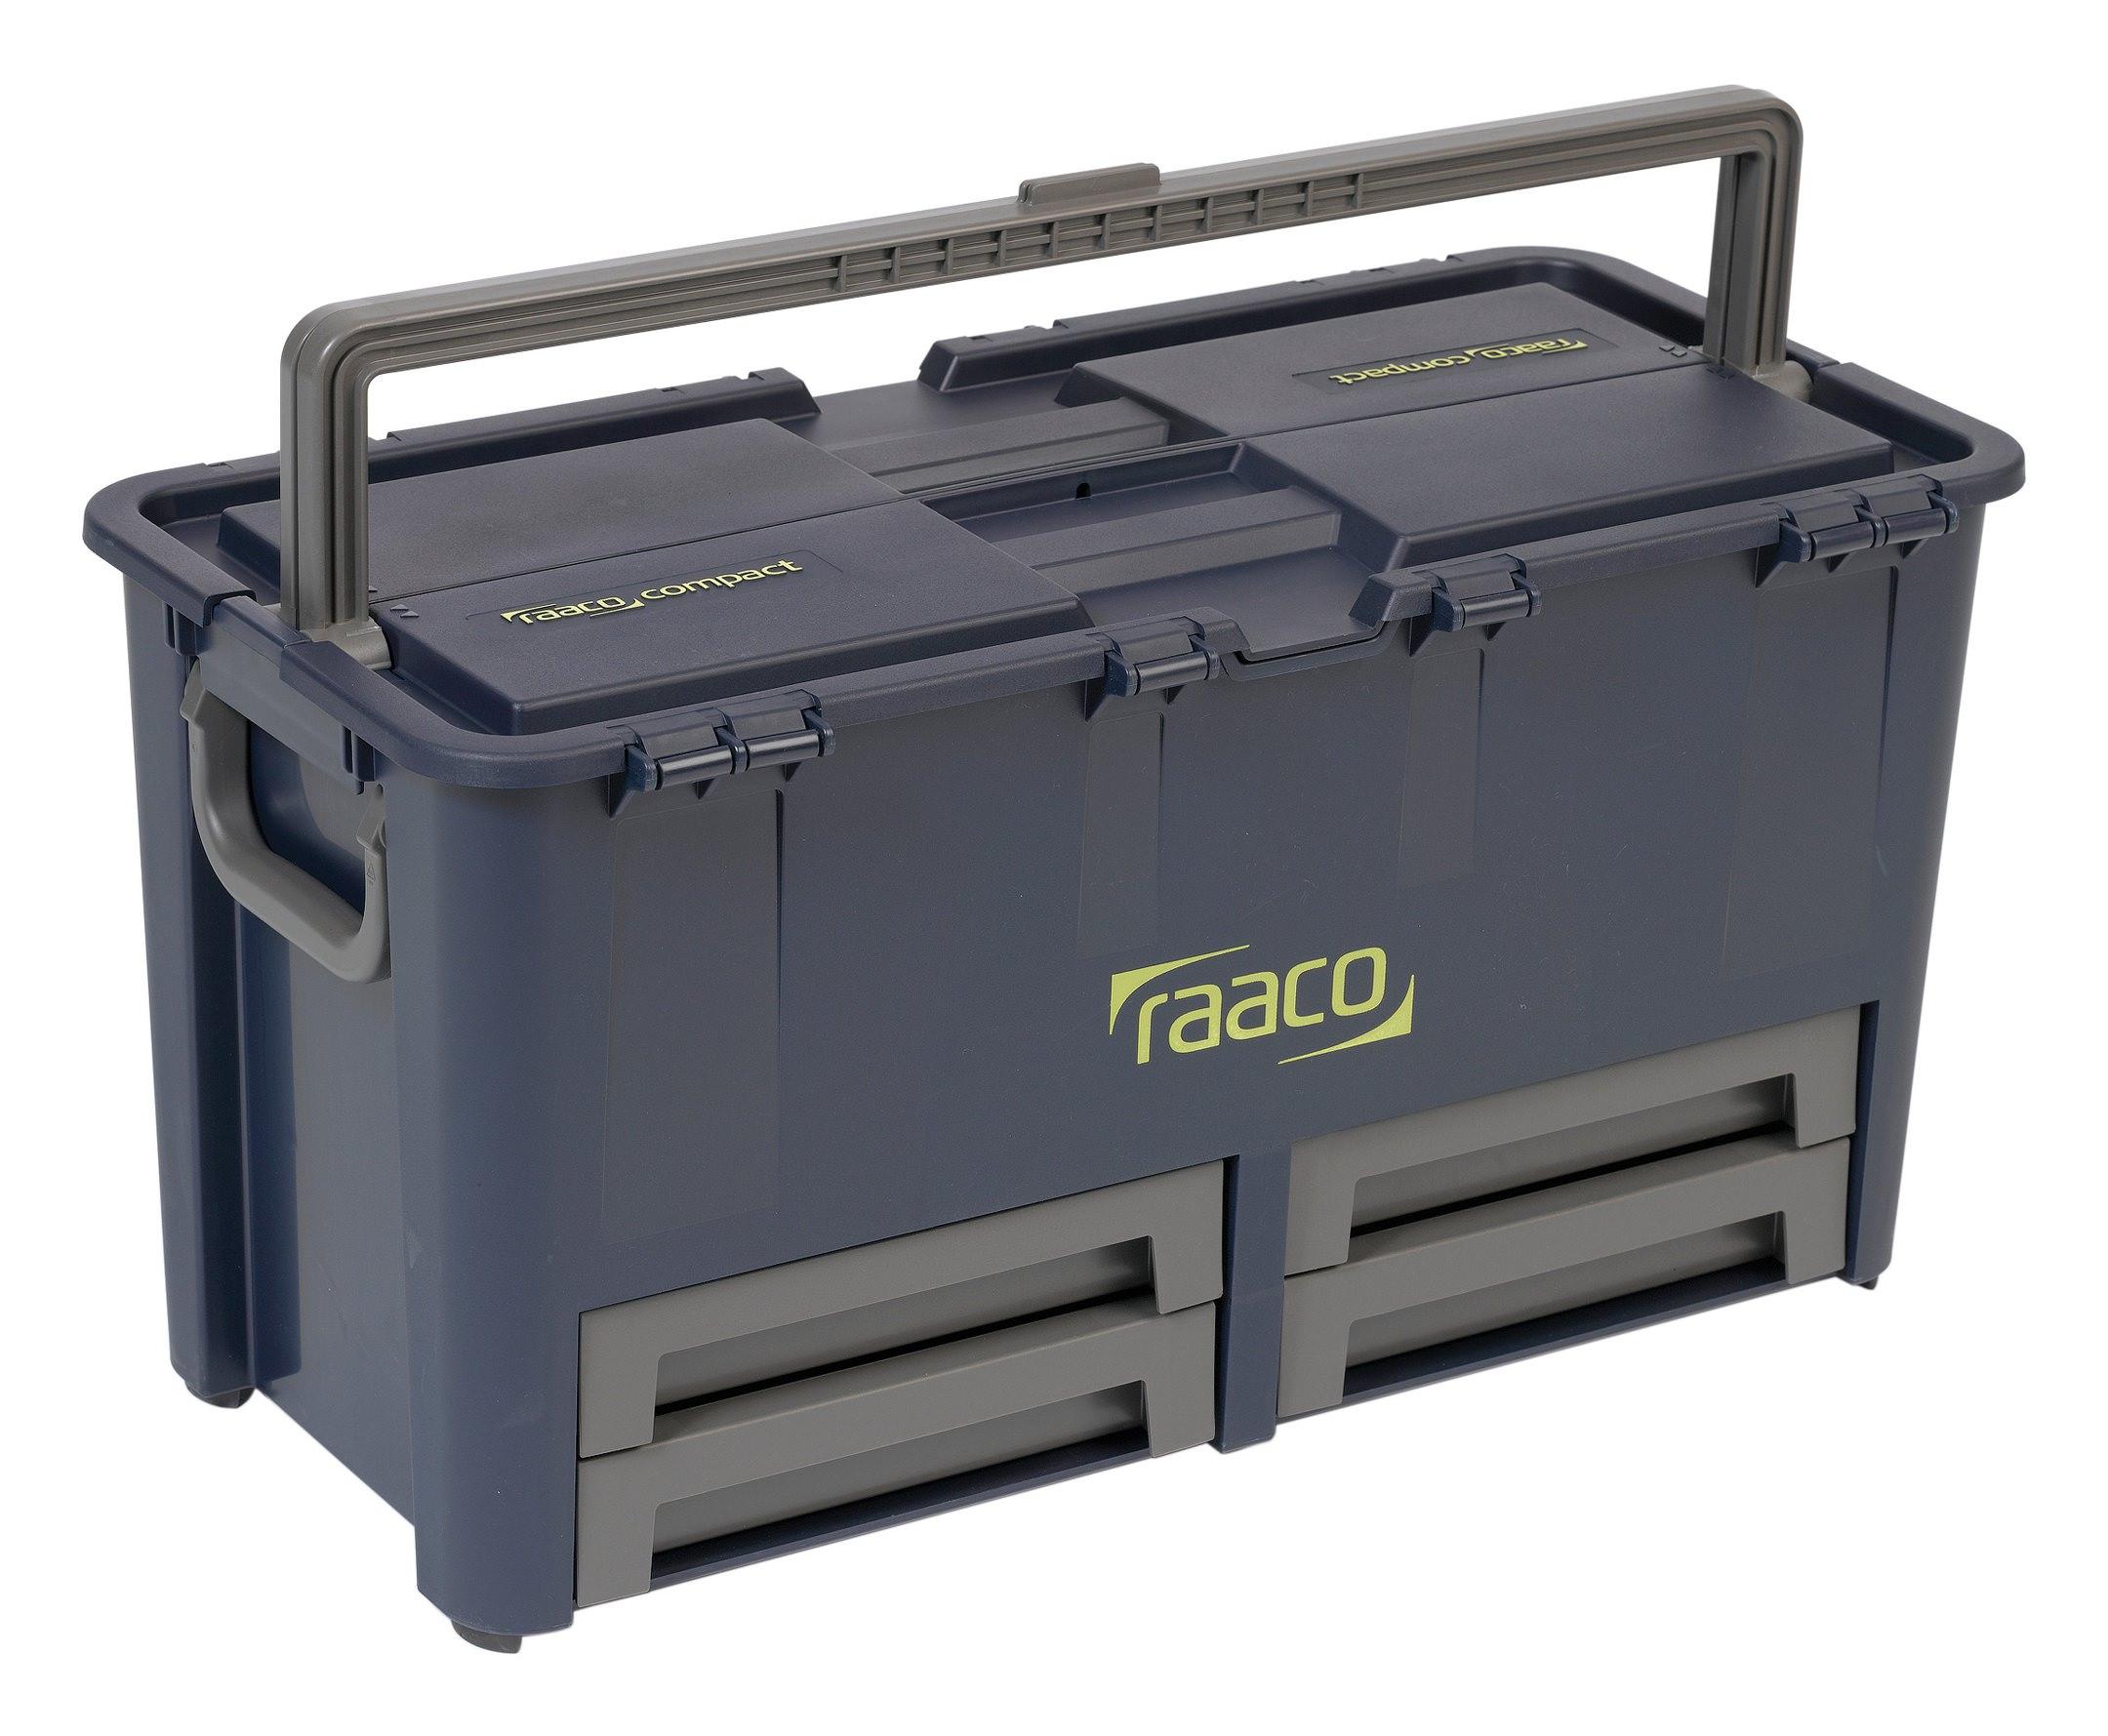 Werkzeugkoffer Compact 62 raaco blau - 136624